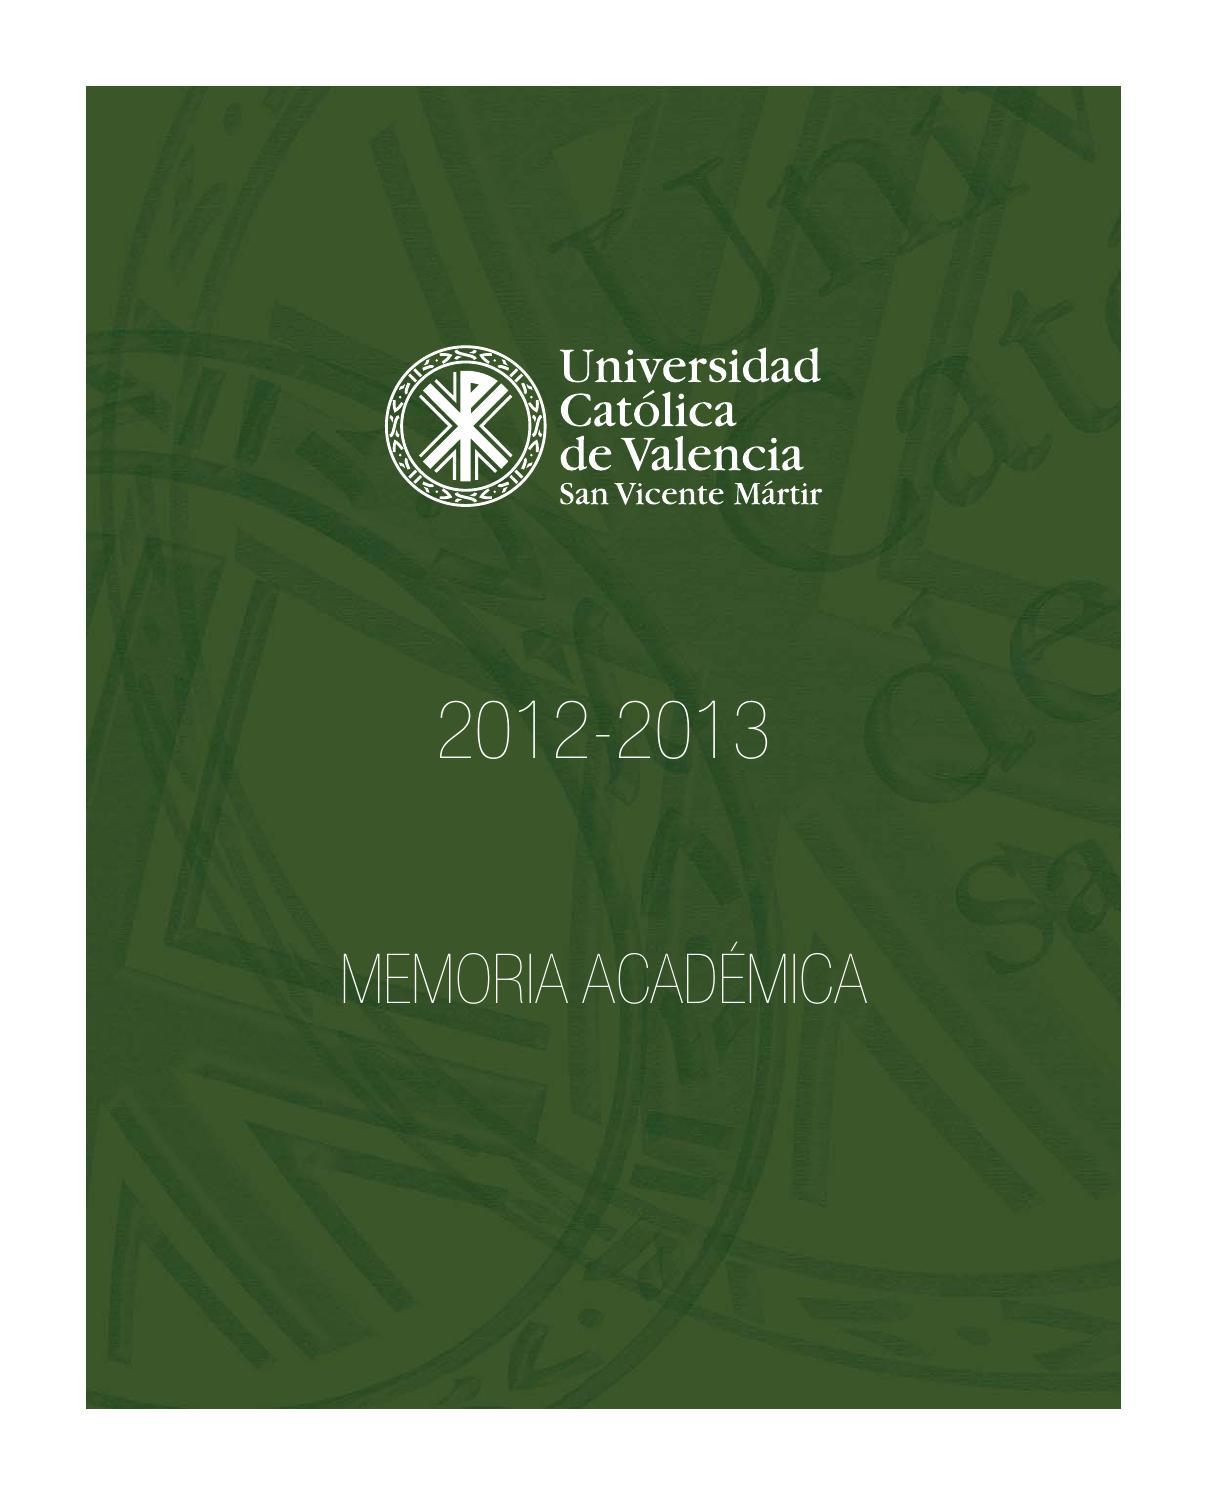 ucv memoria academica 2012 13 by ucv universidad cat243lica